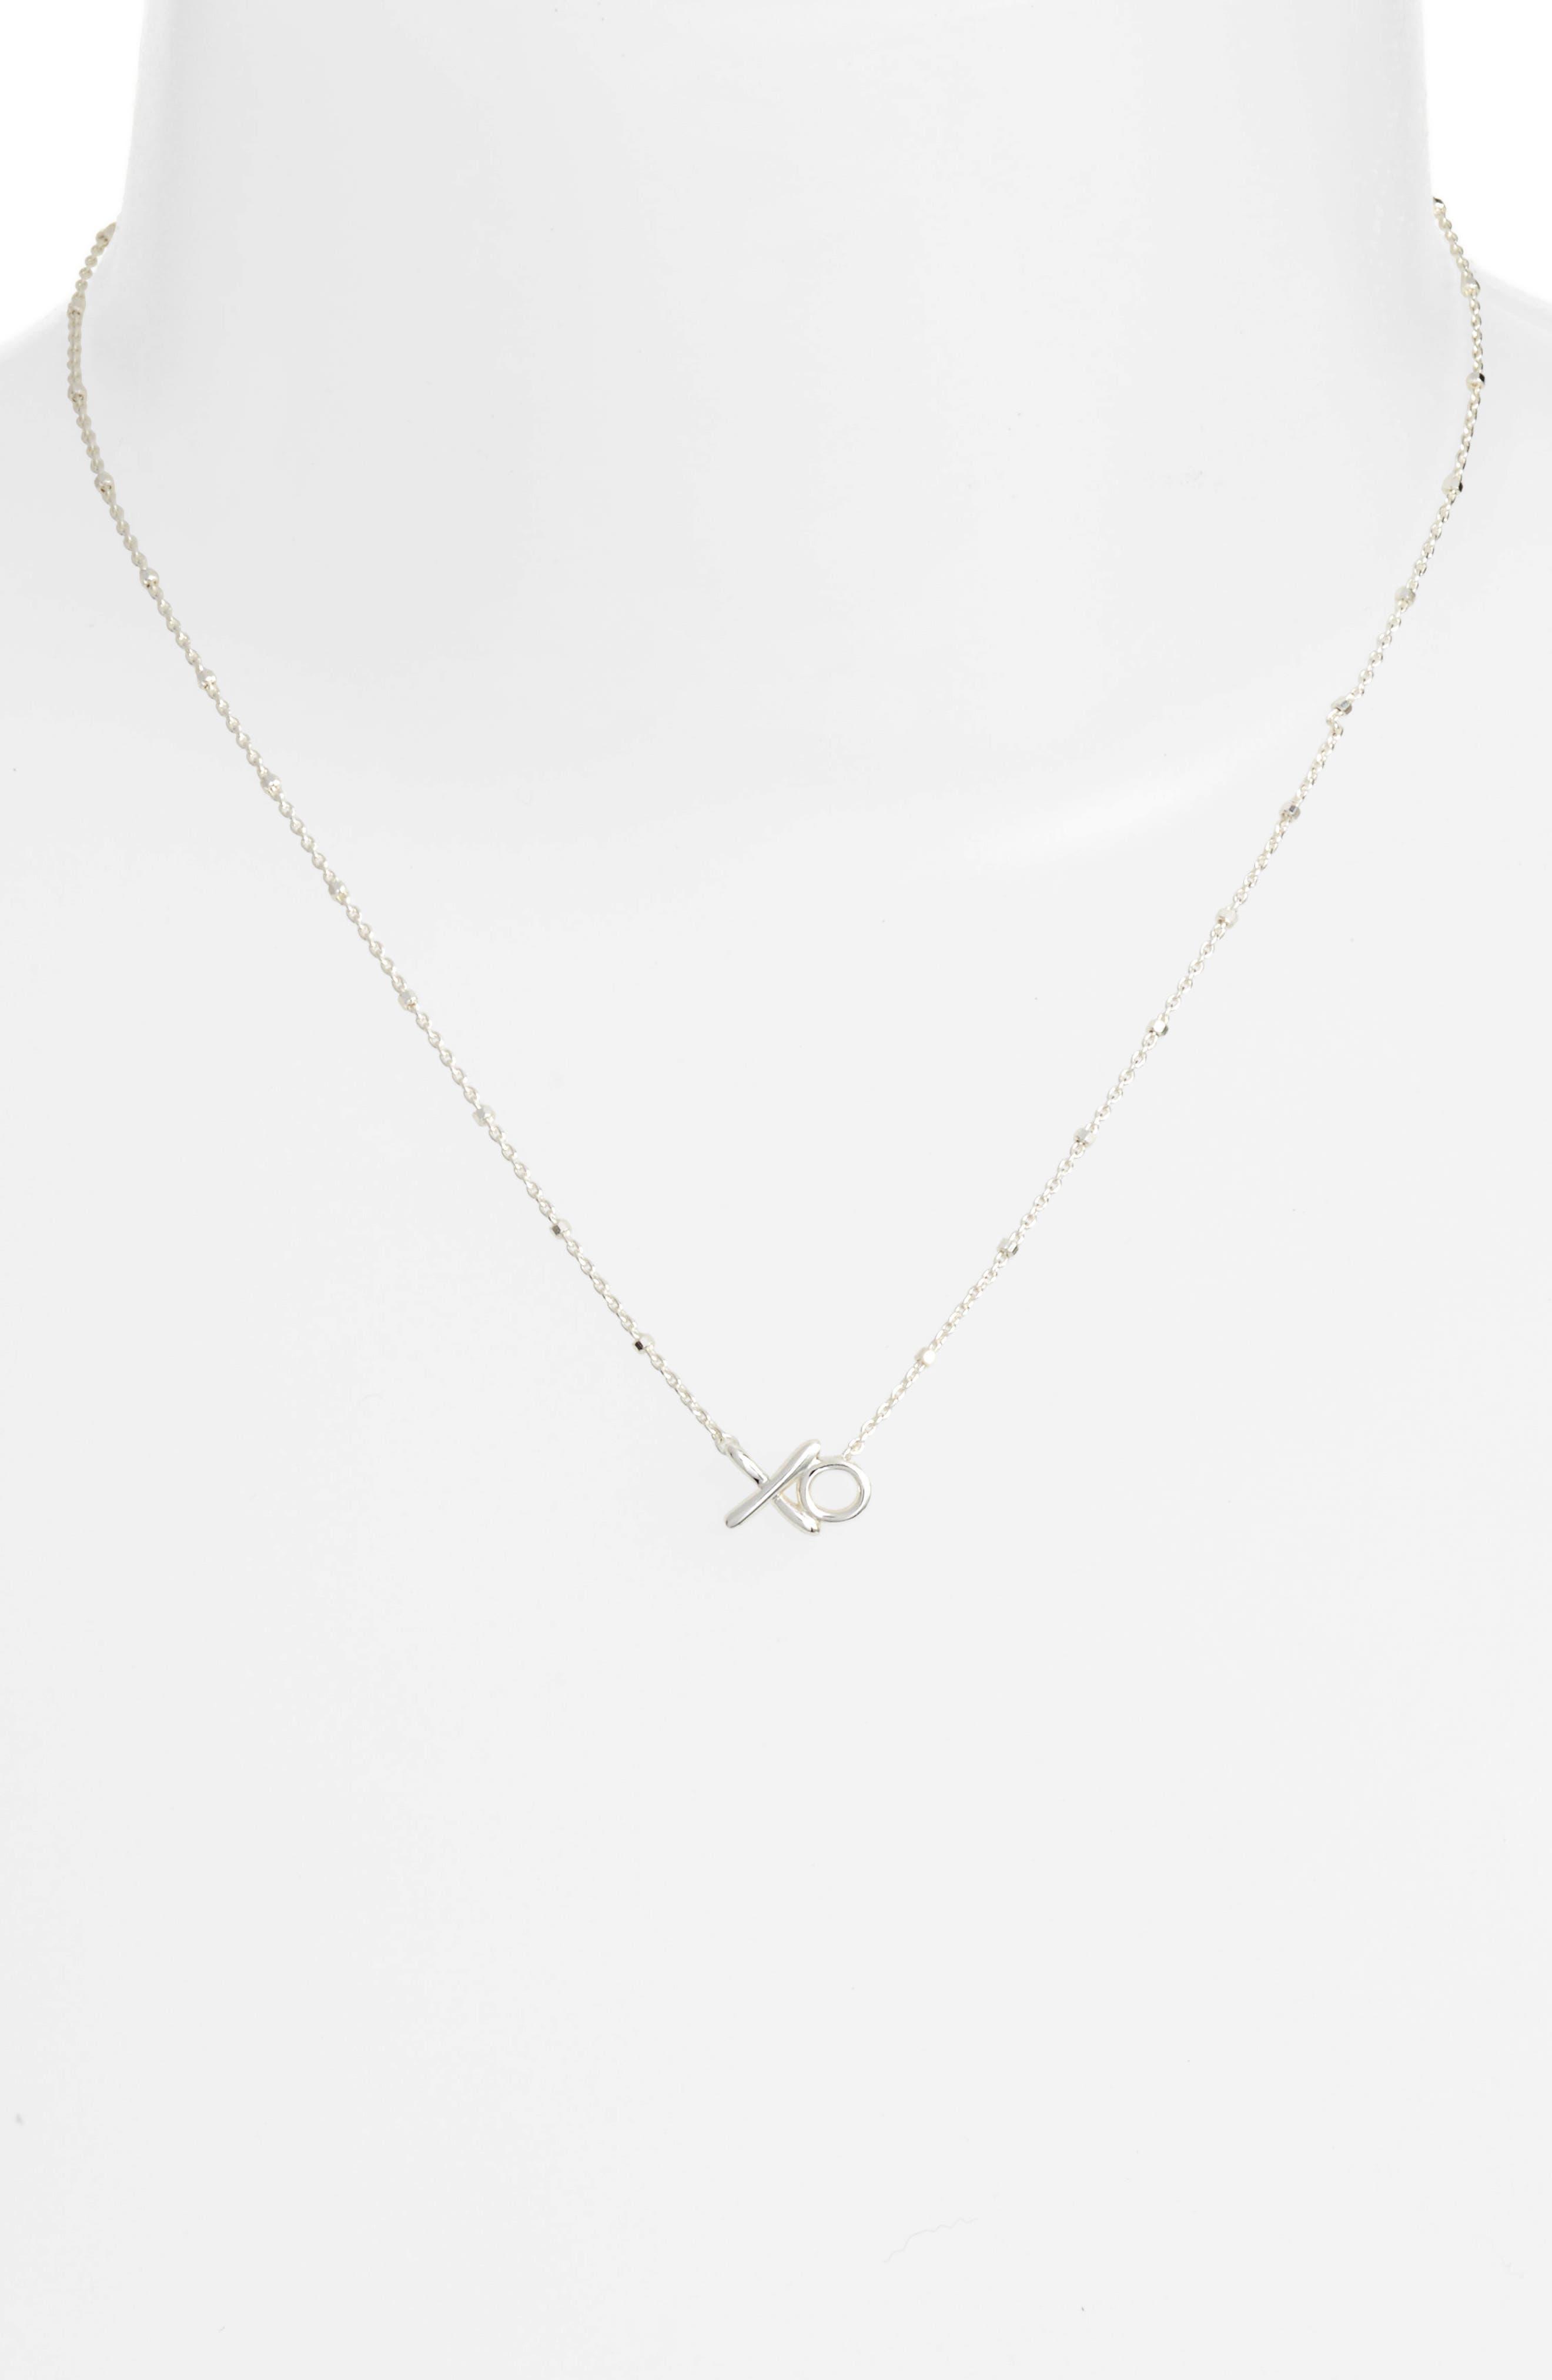 XO Pendant Necklace,                             Alternate thumbnail 2, color,                             Silver